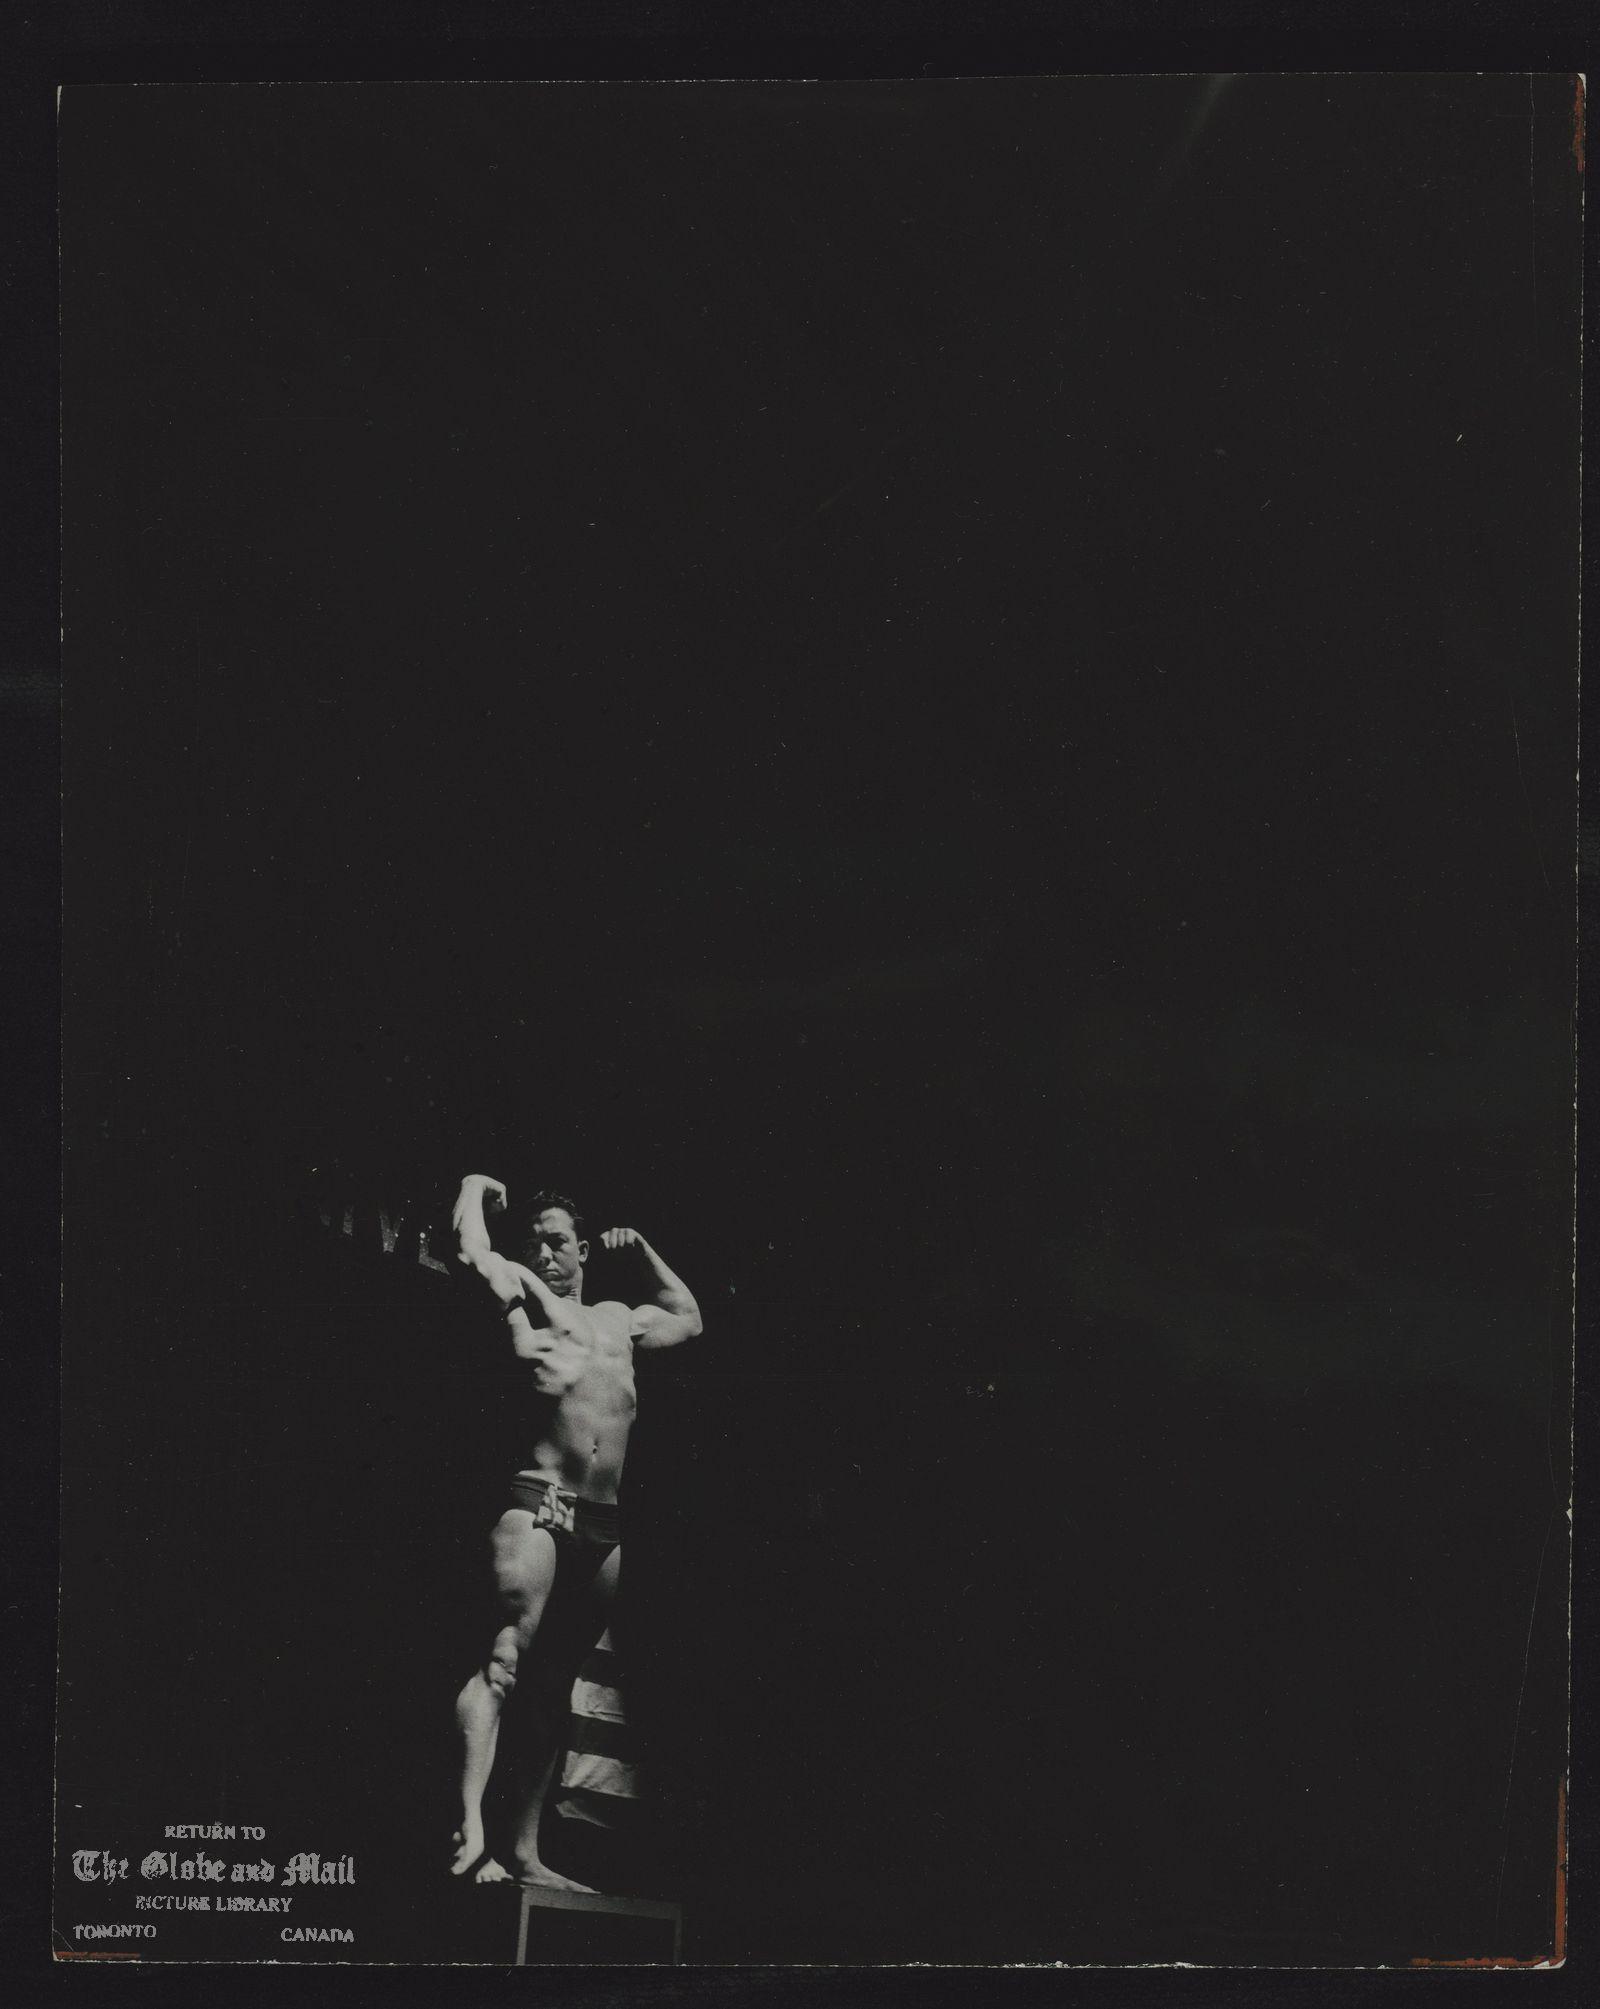 MR. CANADA CONTEST Mr. Universe Contest, Monument Nationale, Montreal, Feb. 1959 In the spotlight, Jeffrey Walling of Gravenhurst in the Mr. Canada Sr. Contest.